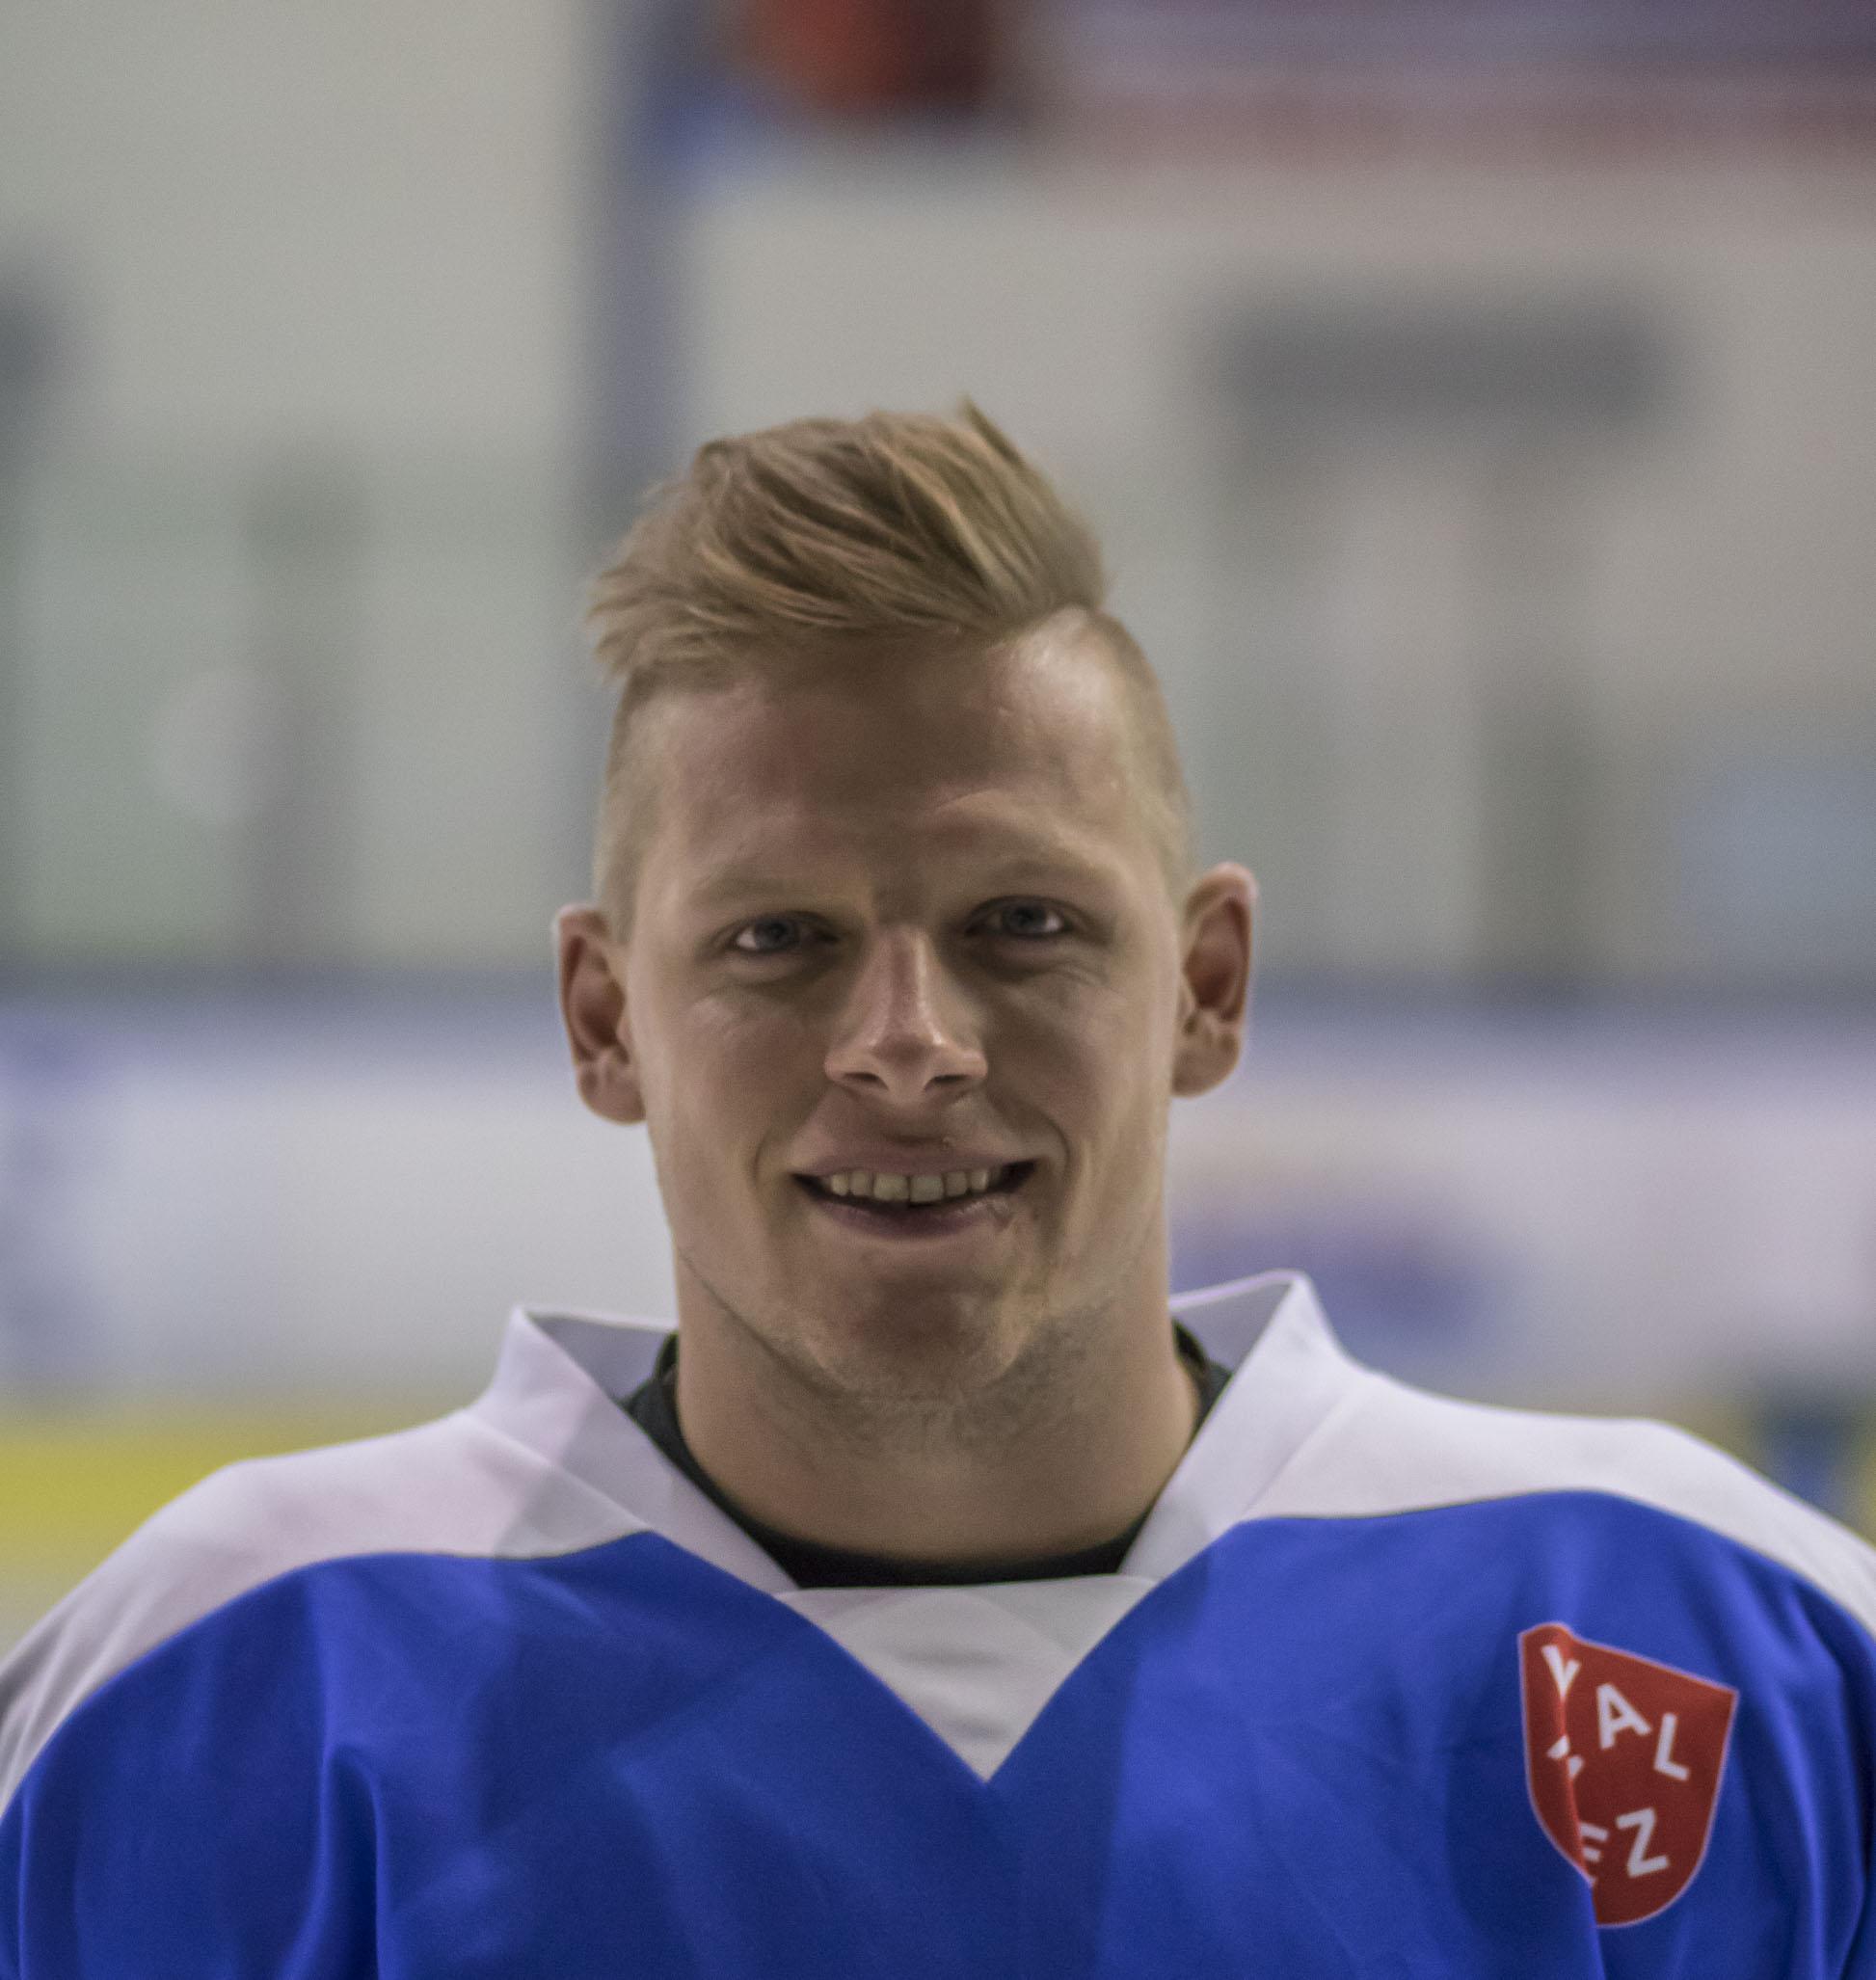 Jakub Poøický #